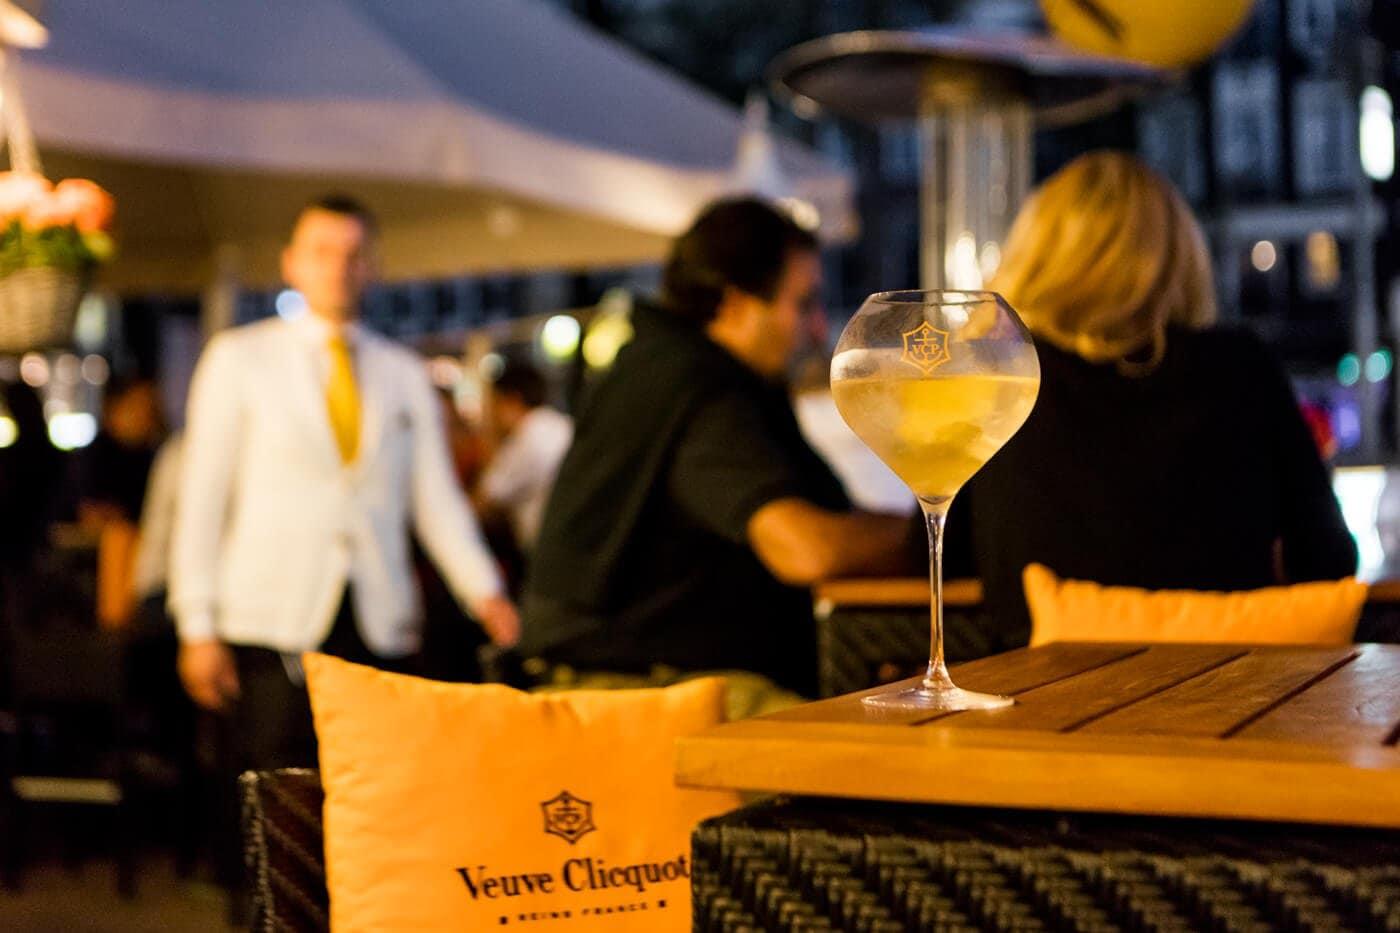 Veuve Clicquot Amsterdam